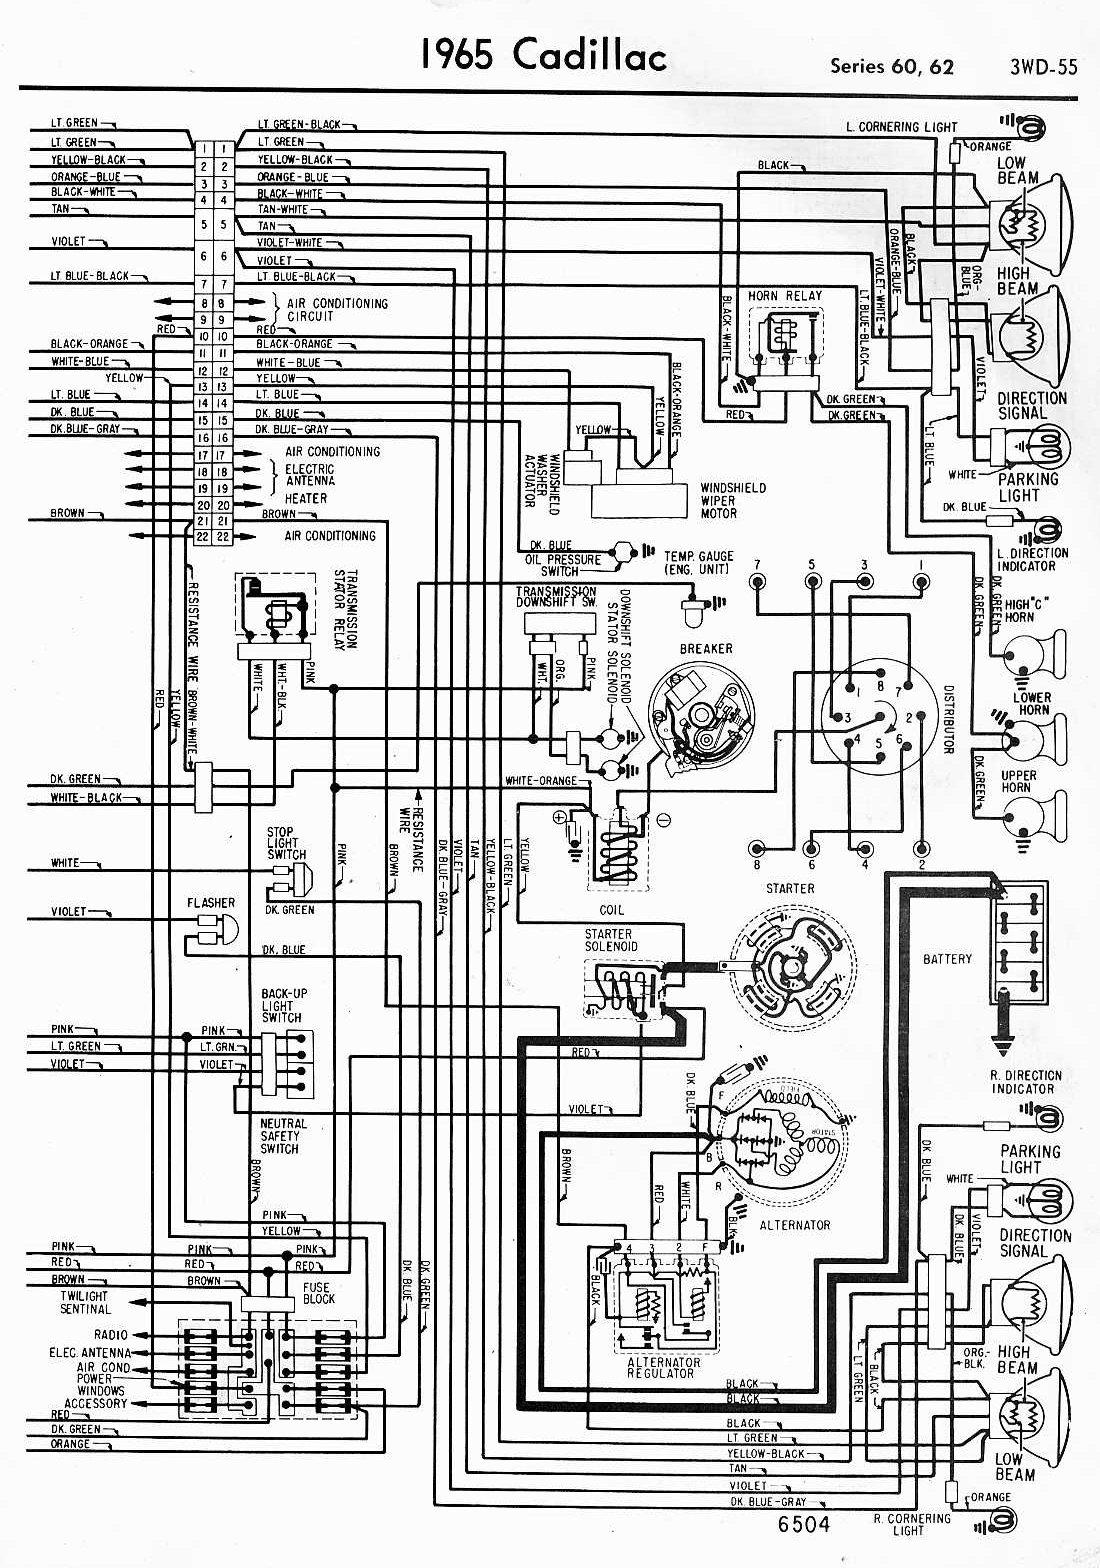 1960 cadillac wiring diagram wiring diagram rh vw37 reise ferienplan de